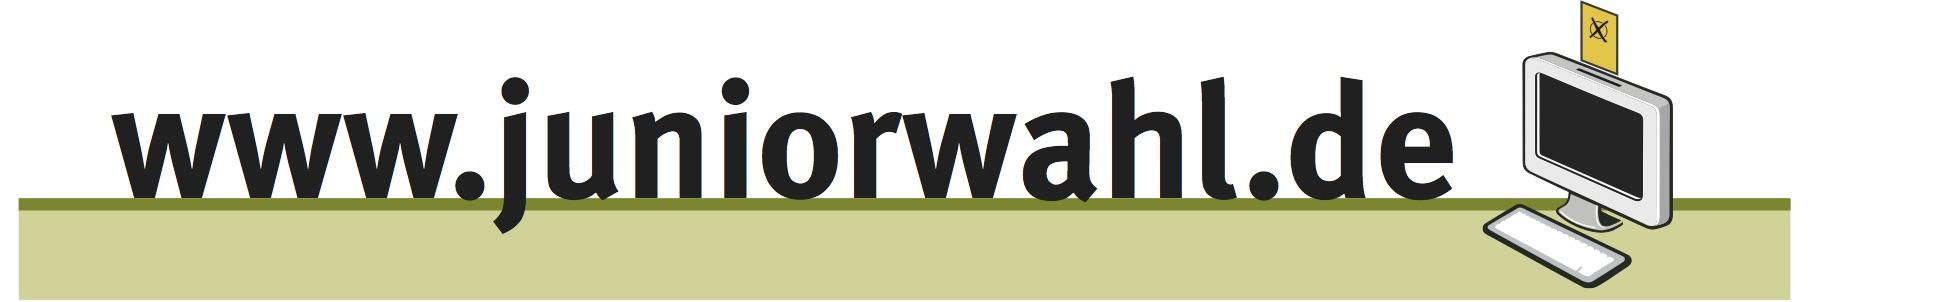 logo-juniorwahl